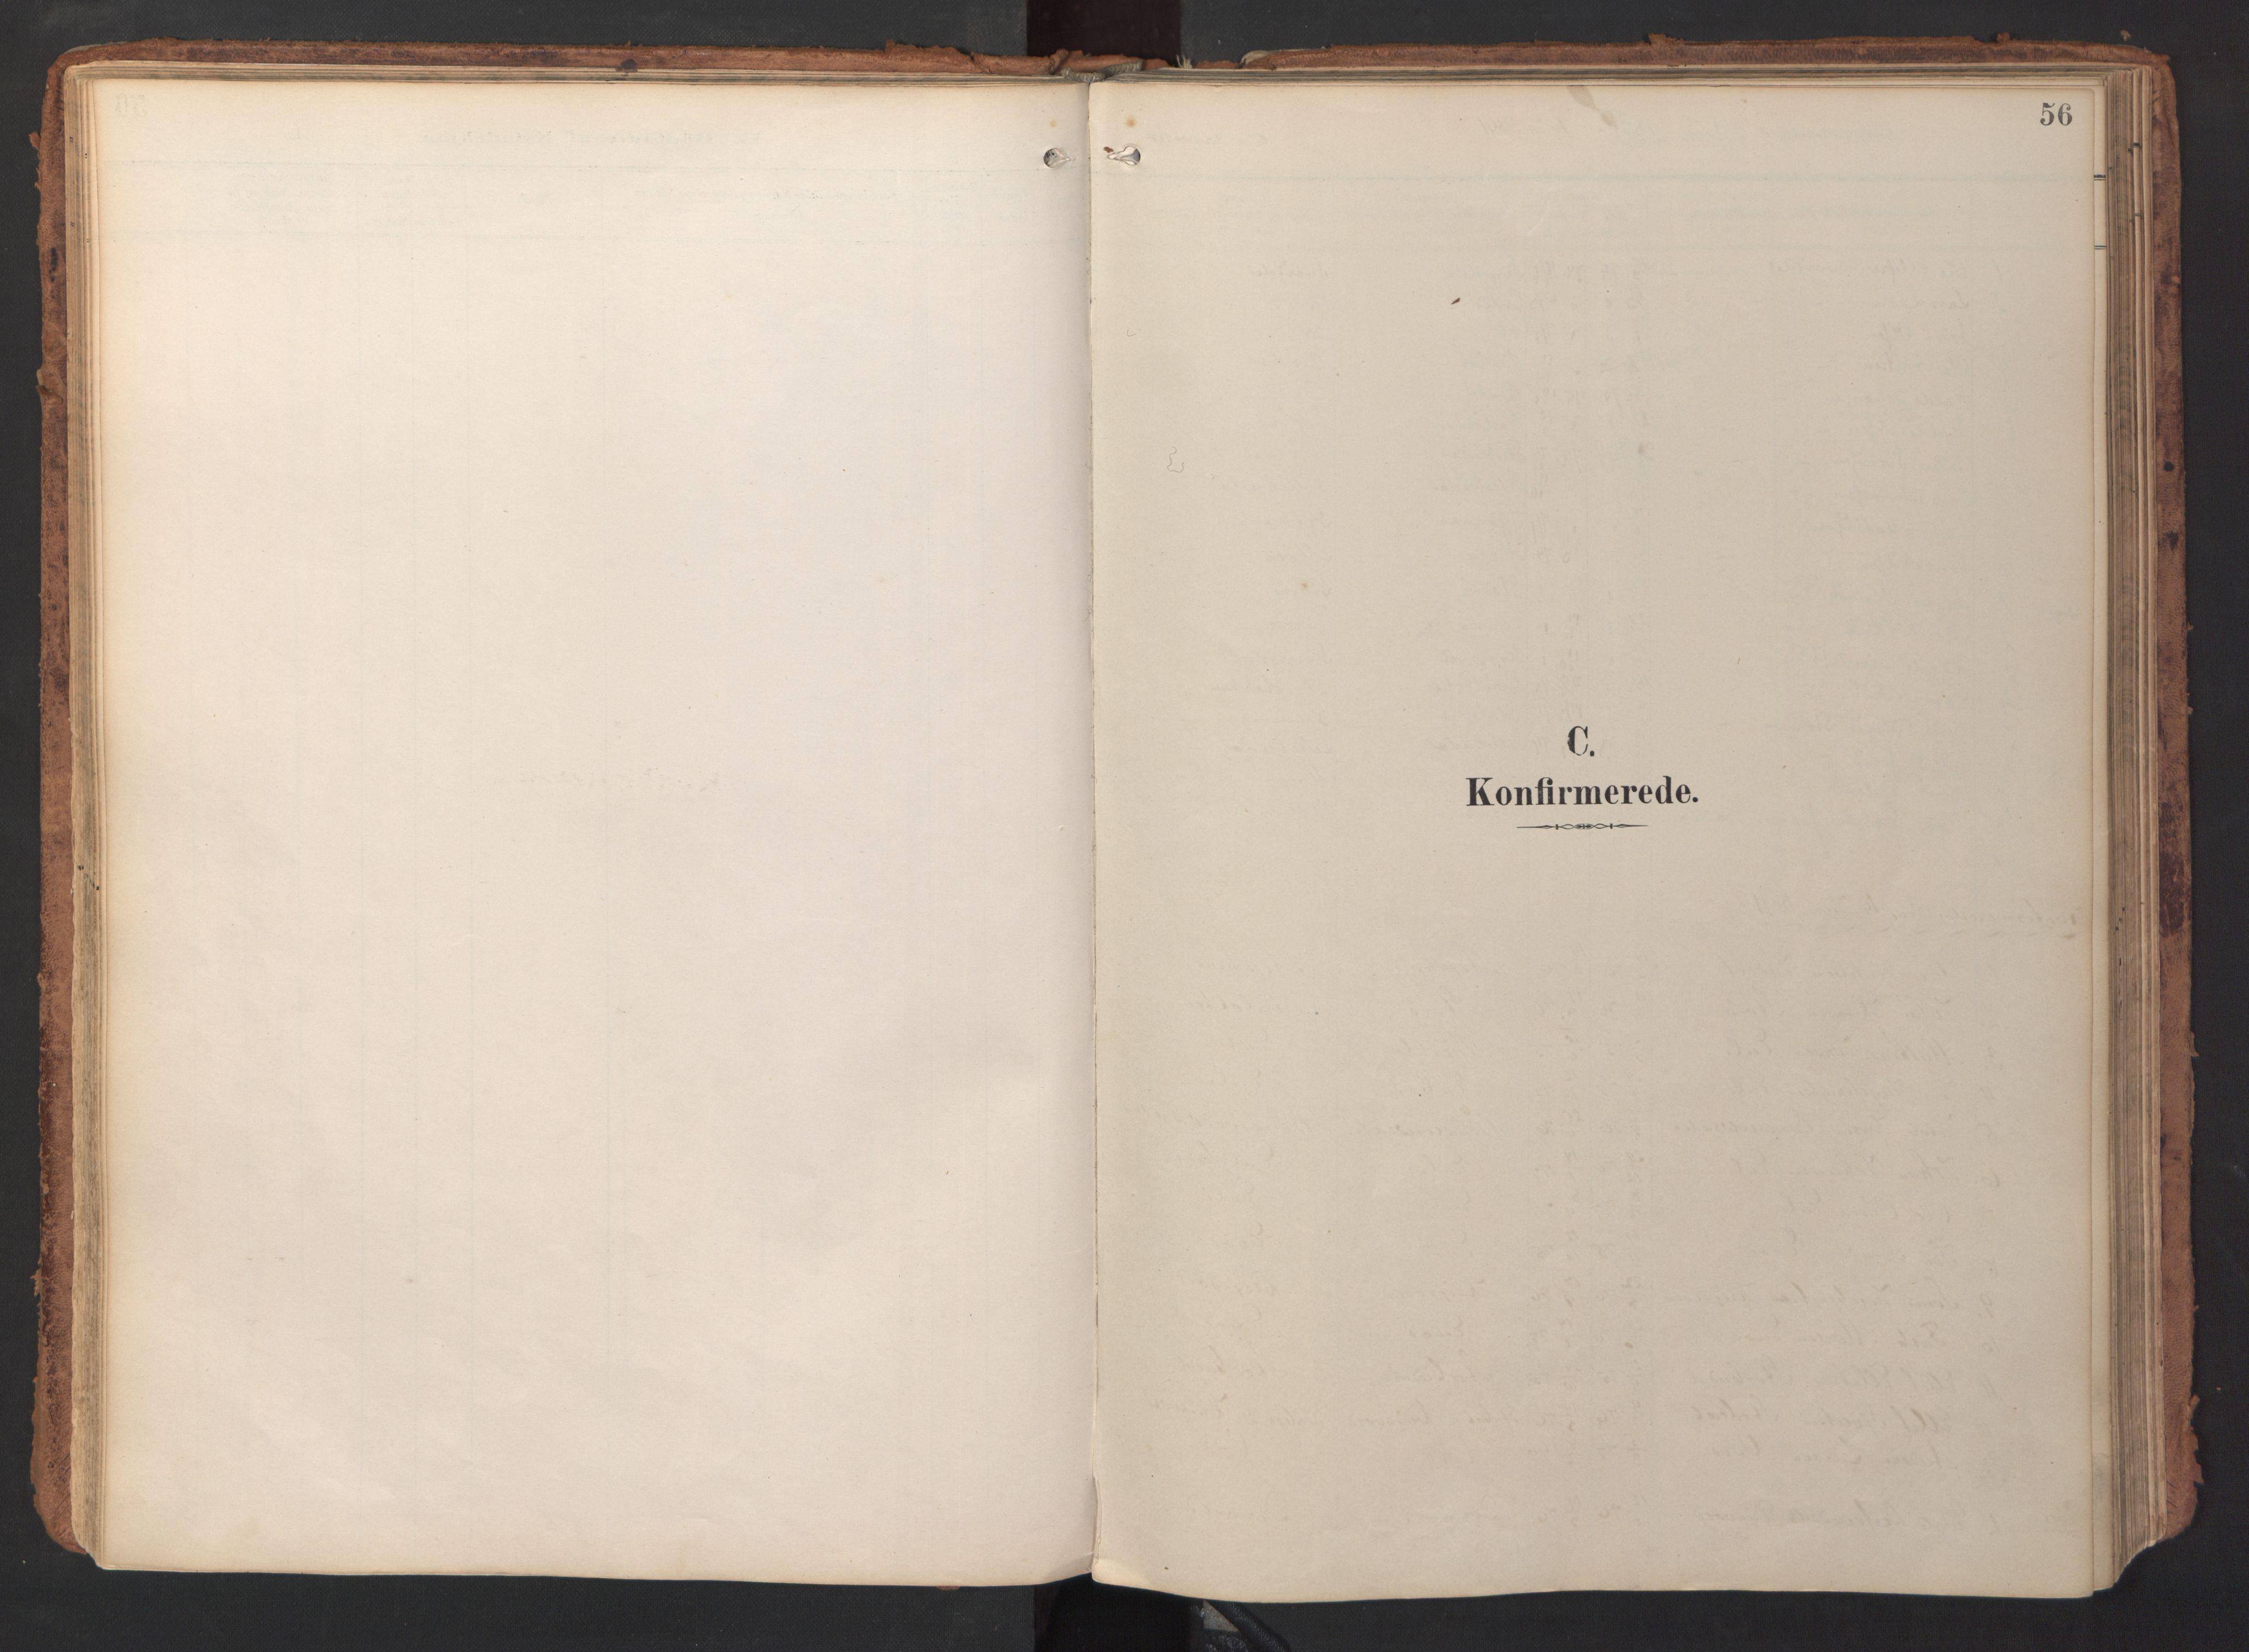 SAT, Ministerialprotokoller, klokkerbøker og fødselsregistre - Sør-Trøndelag, 690/L1050: Parish register (official) no. 690A01, 1889-1929, p. 56